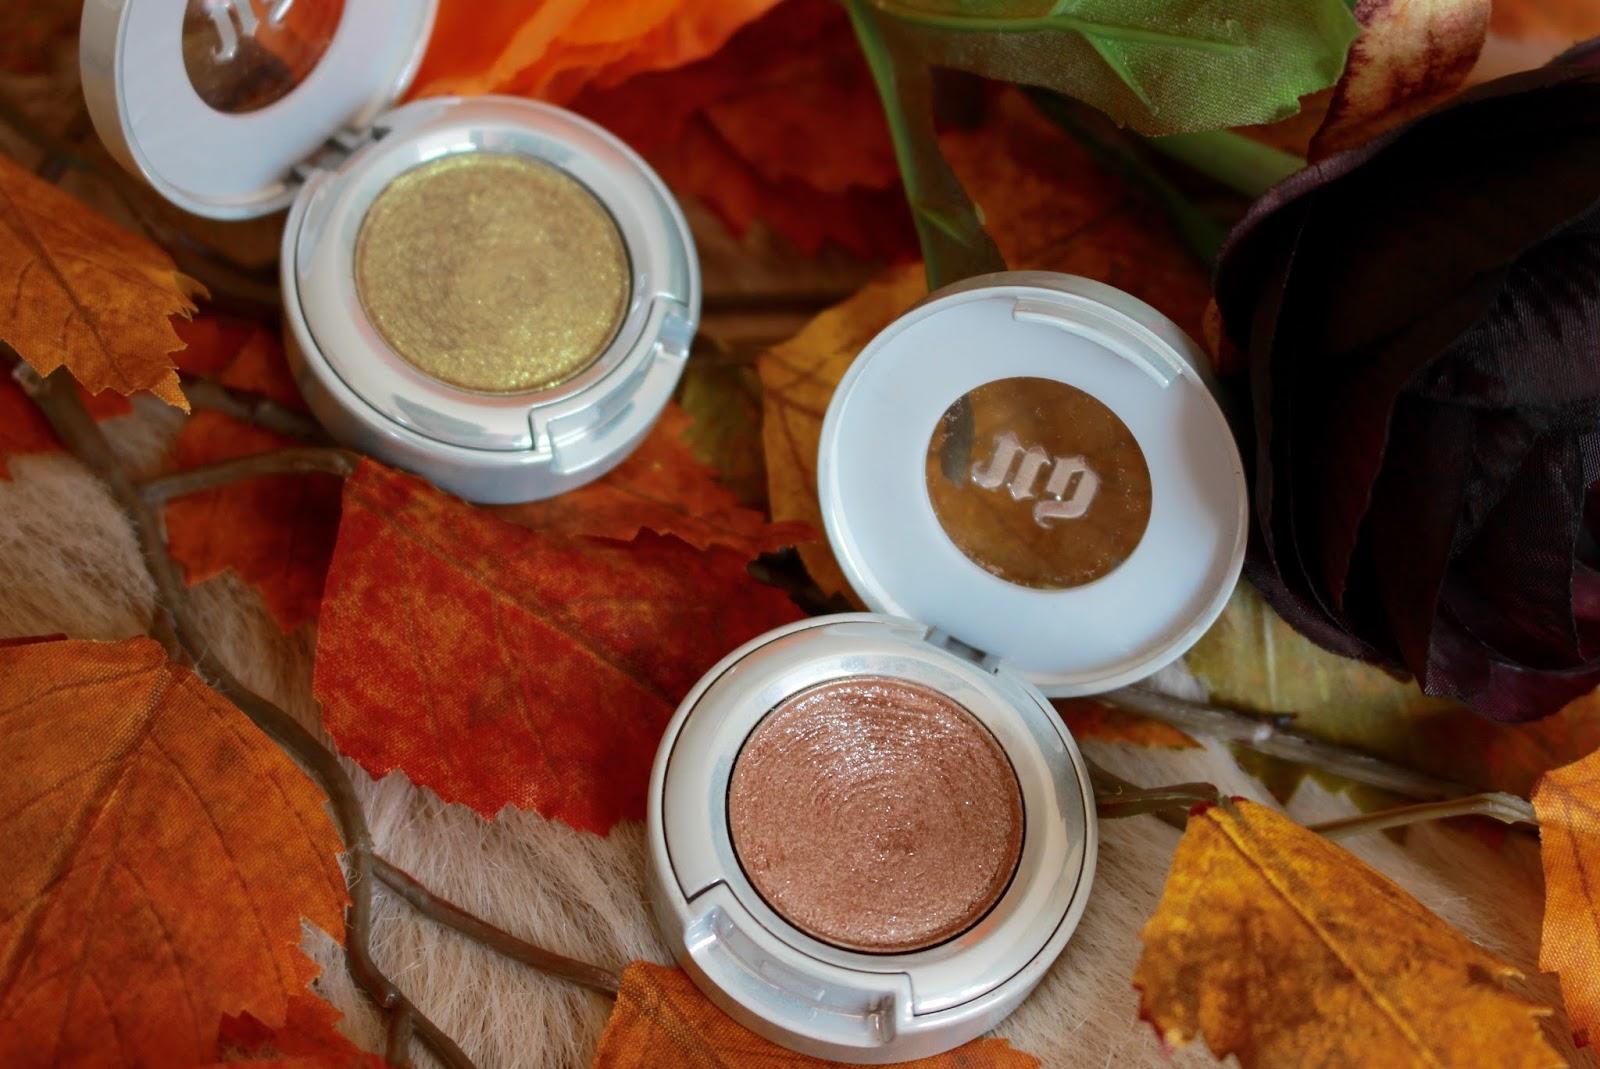 Urban Decay Glitter Eyeshadow Review Autumn Fall